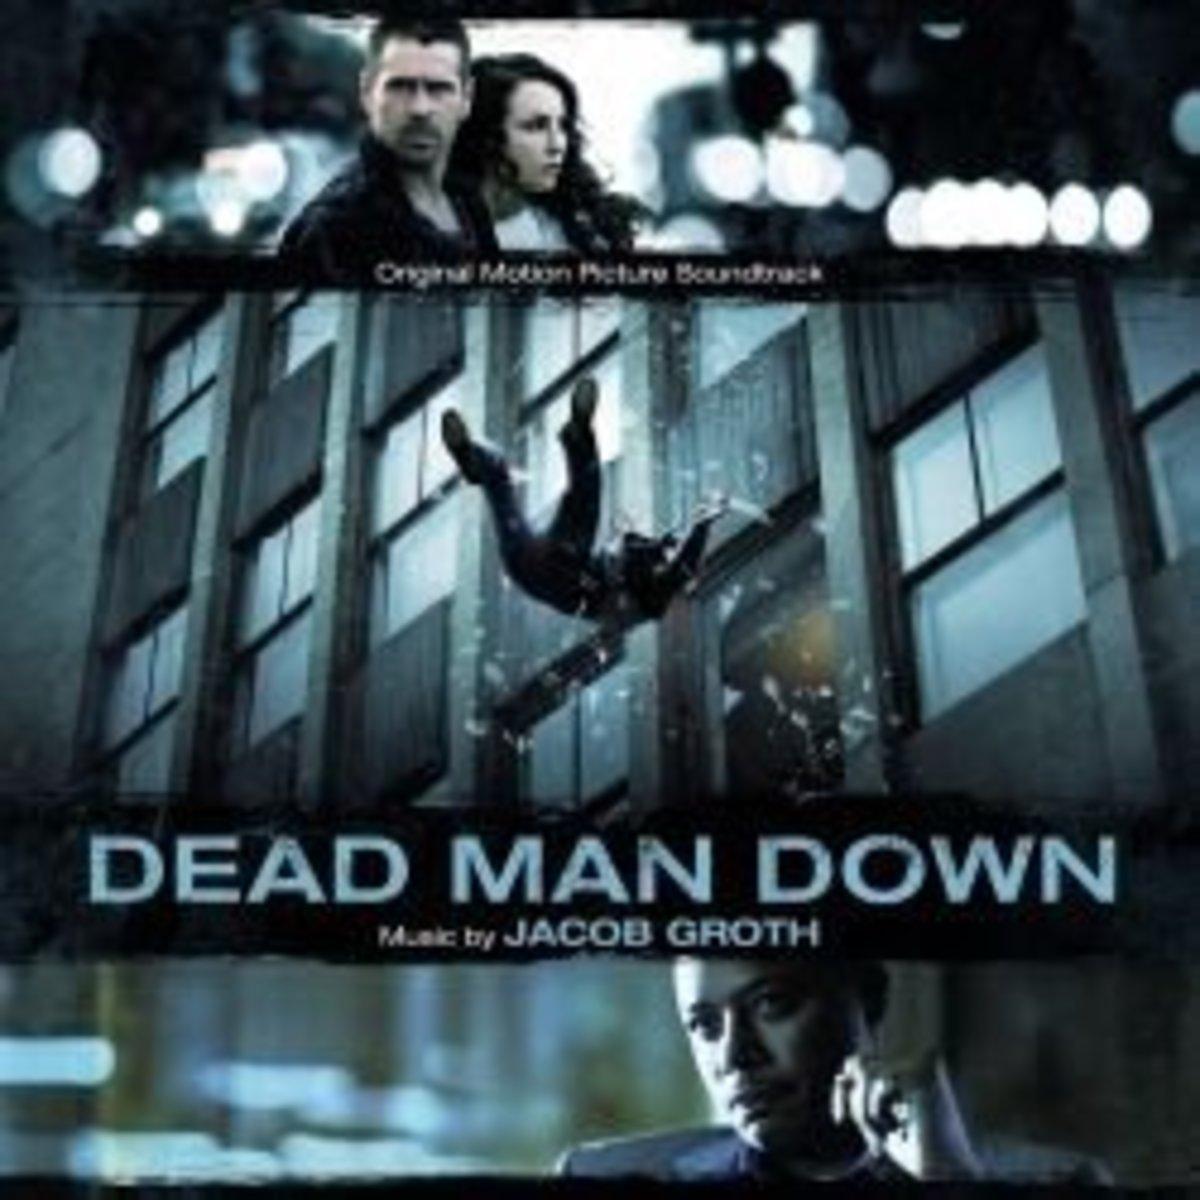 Dead Man Down Soundtrack: List of Songs